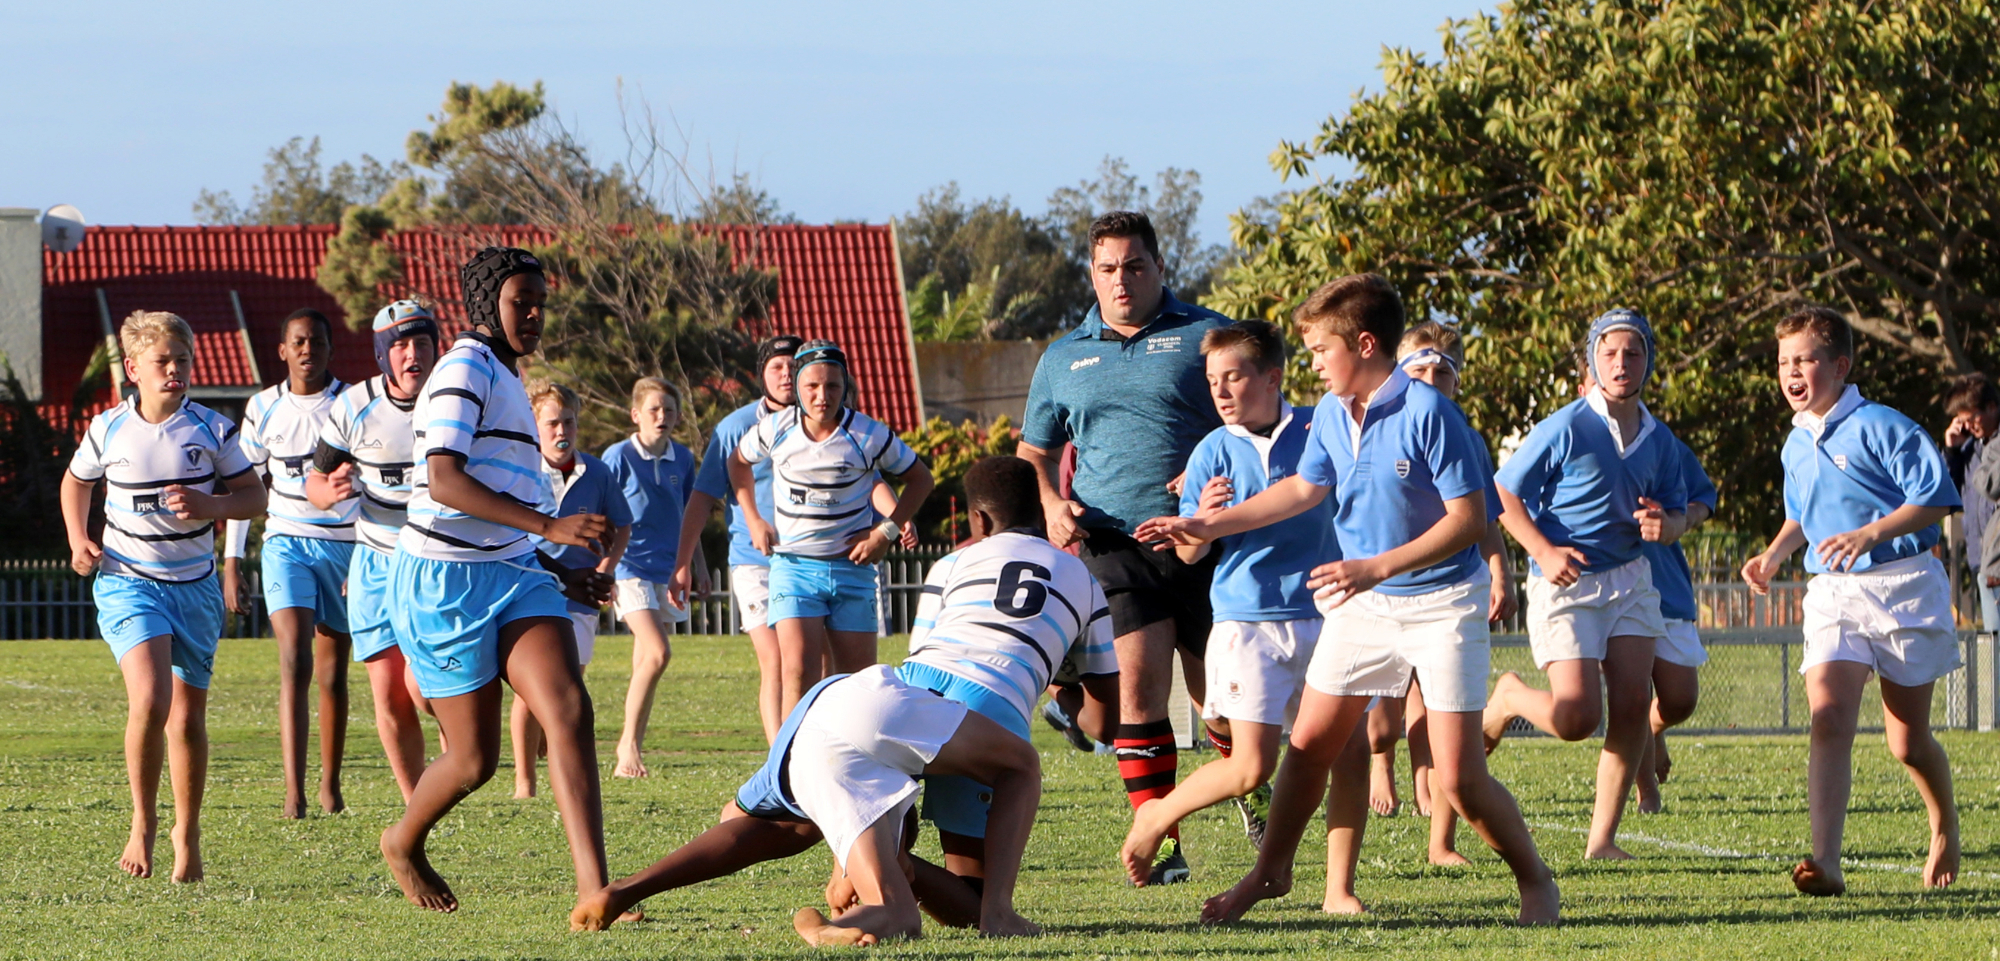 Summerwood Primary School Rugby 2019 Pho